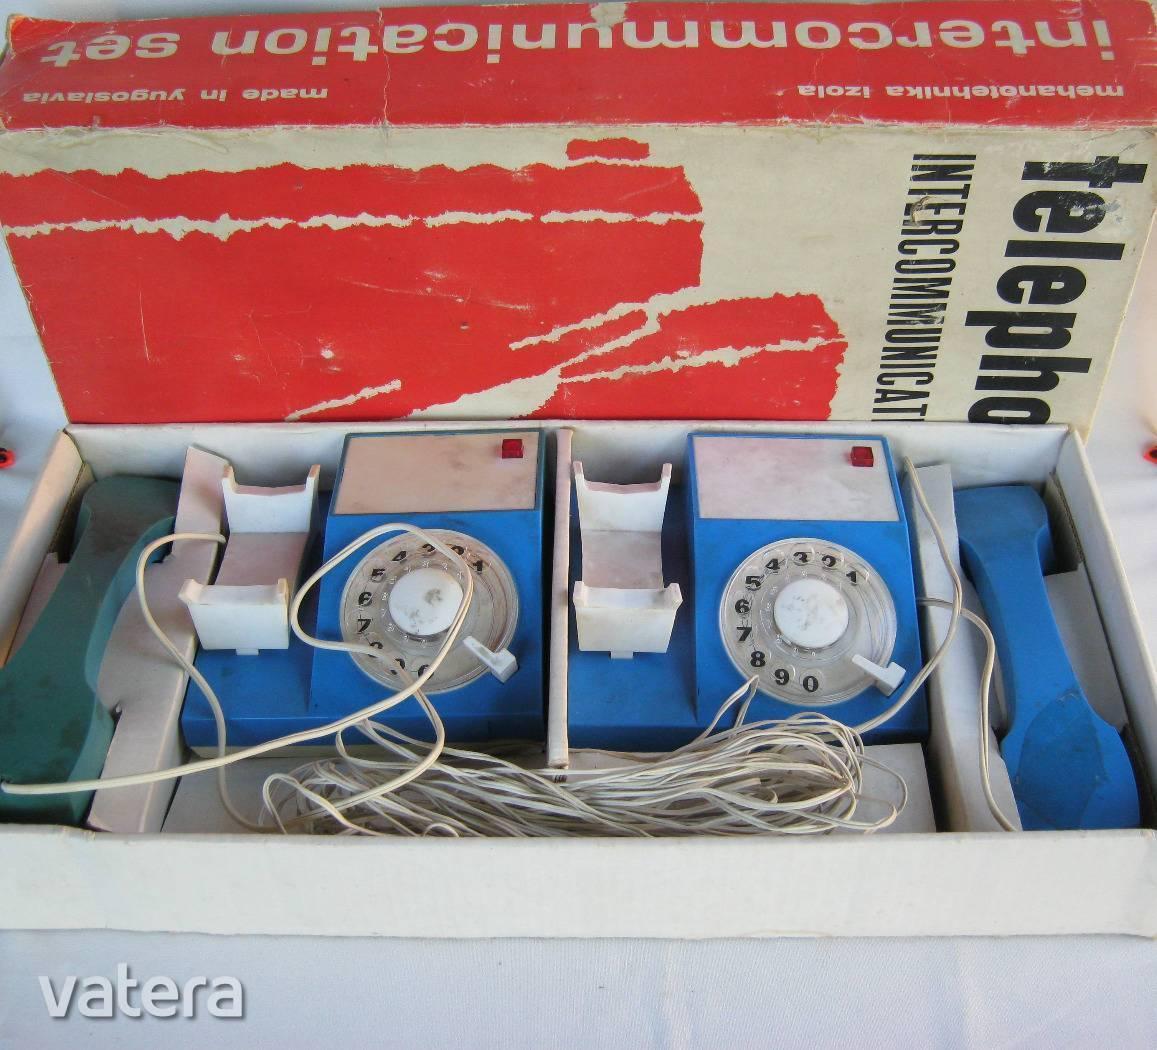 retro-jugoszlav-muanyag-jatek-telefon-eredeti-dobozaban-825b_1_big_1.jpg